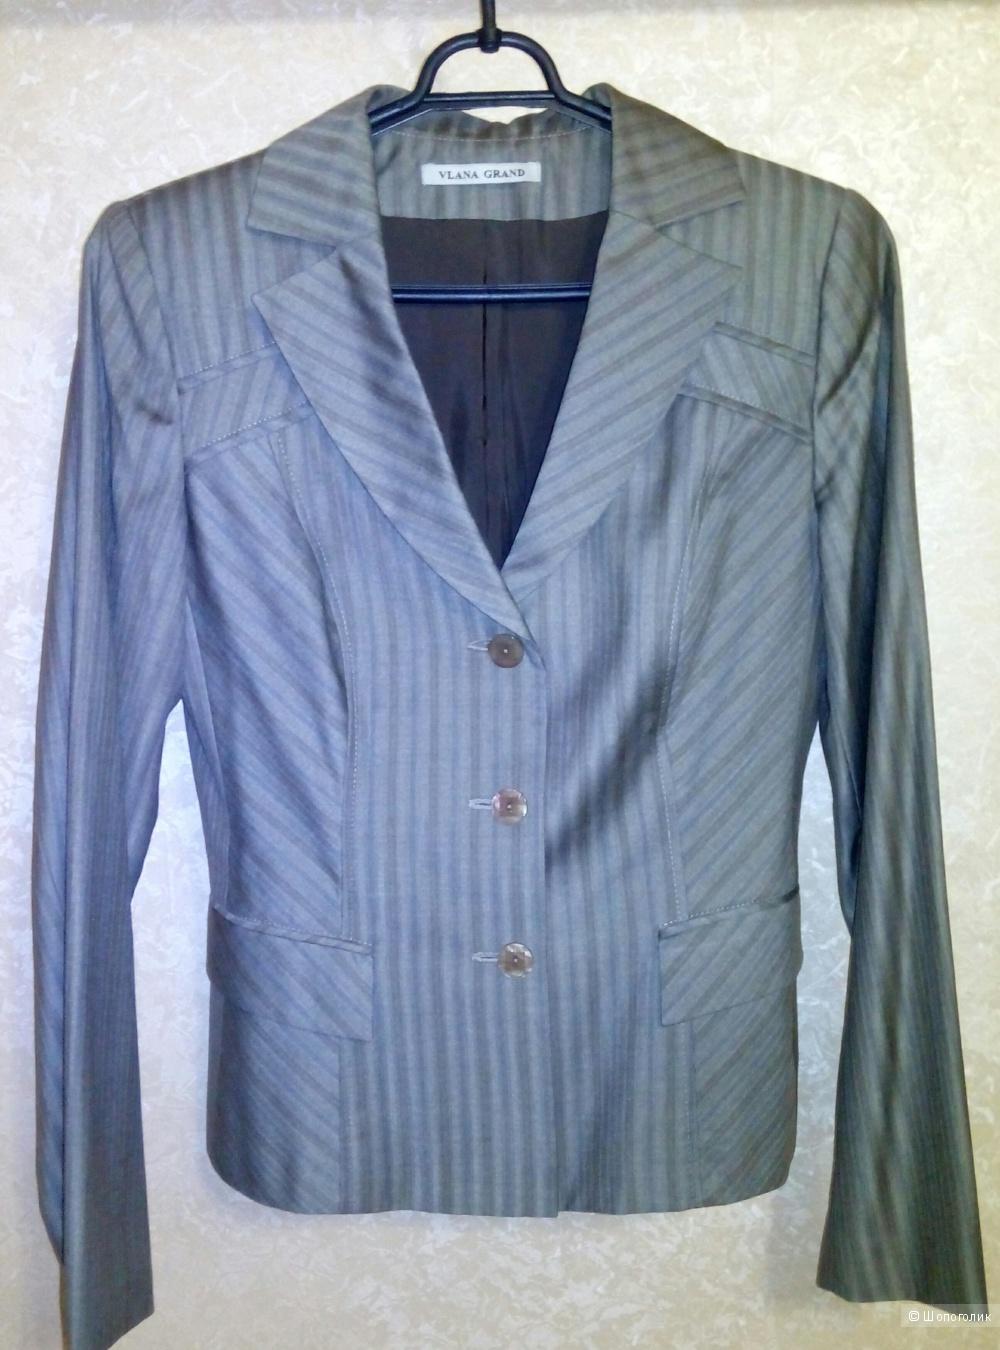 Пиджак Vlana Grand 46 размер